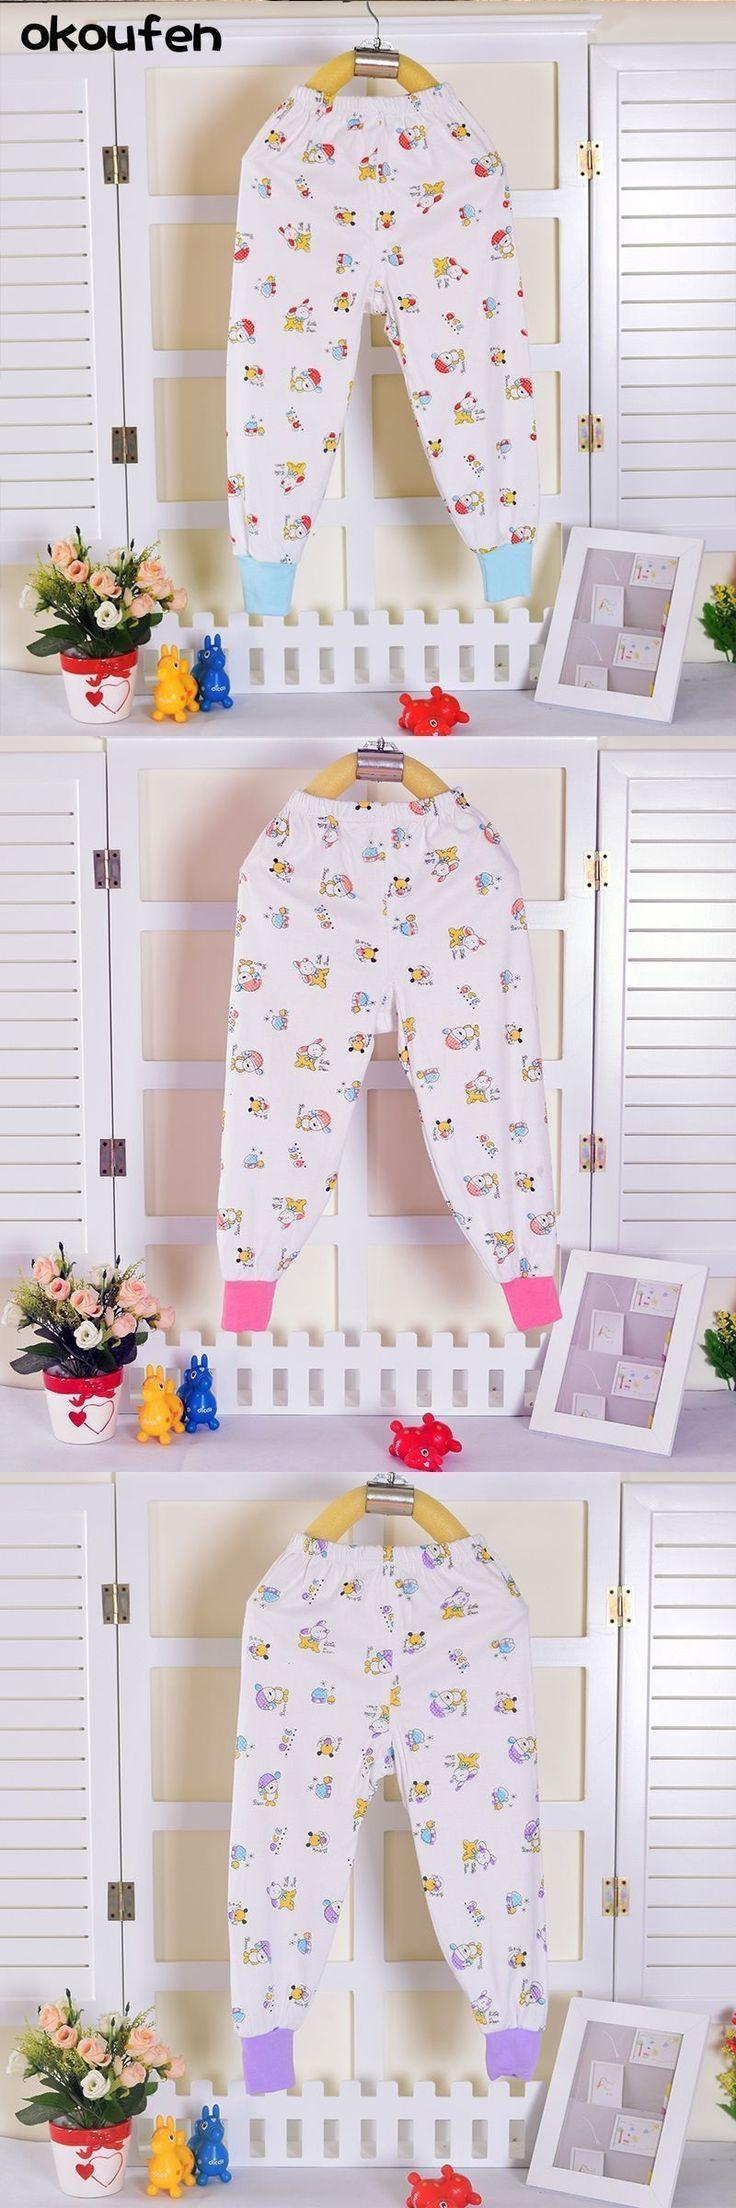 2017 new fashion baby girl pant quality brand baby boys pants children kids clothes underwear baby girls leggings retail #babygirlleggings #babyunderwear #babygirlunderwear